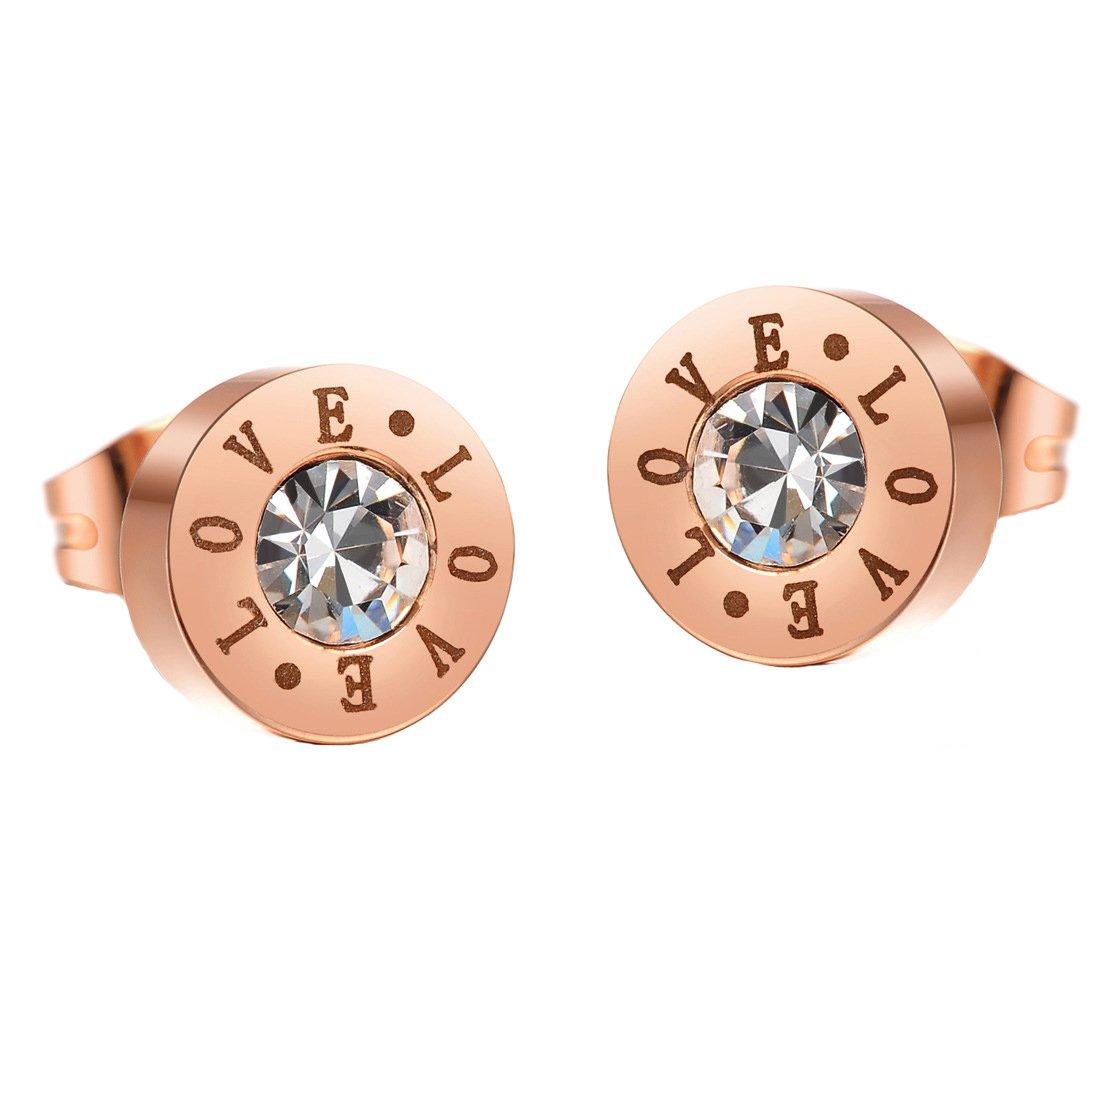 D.B.MOOD Womens Rose Gold Plated Earrings Stainless Steel Love Rhinestone Stud Earrings